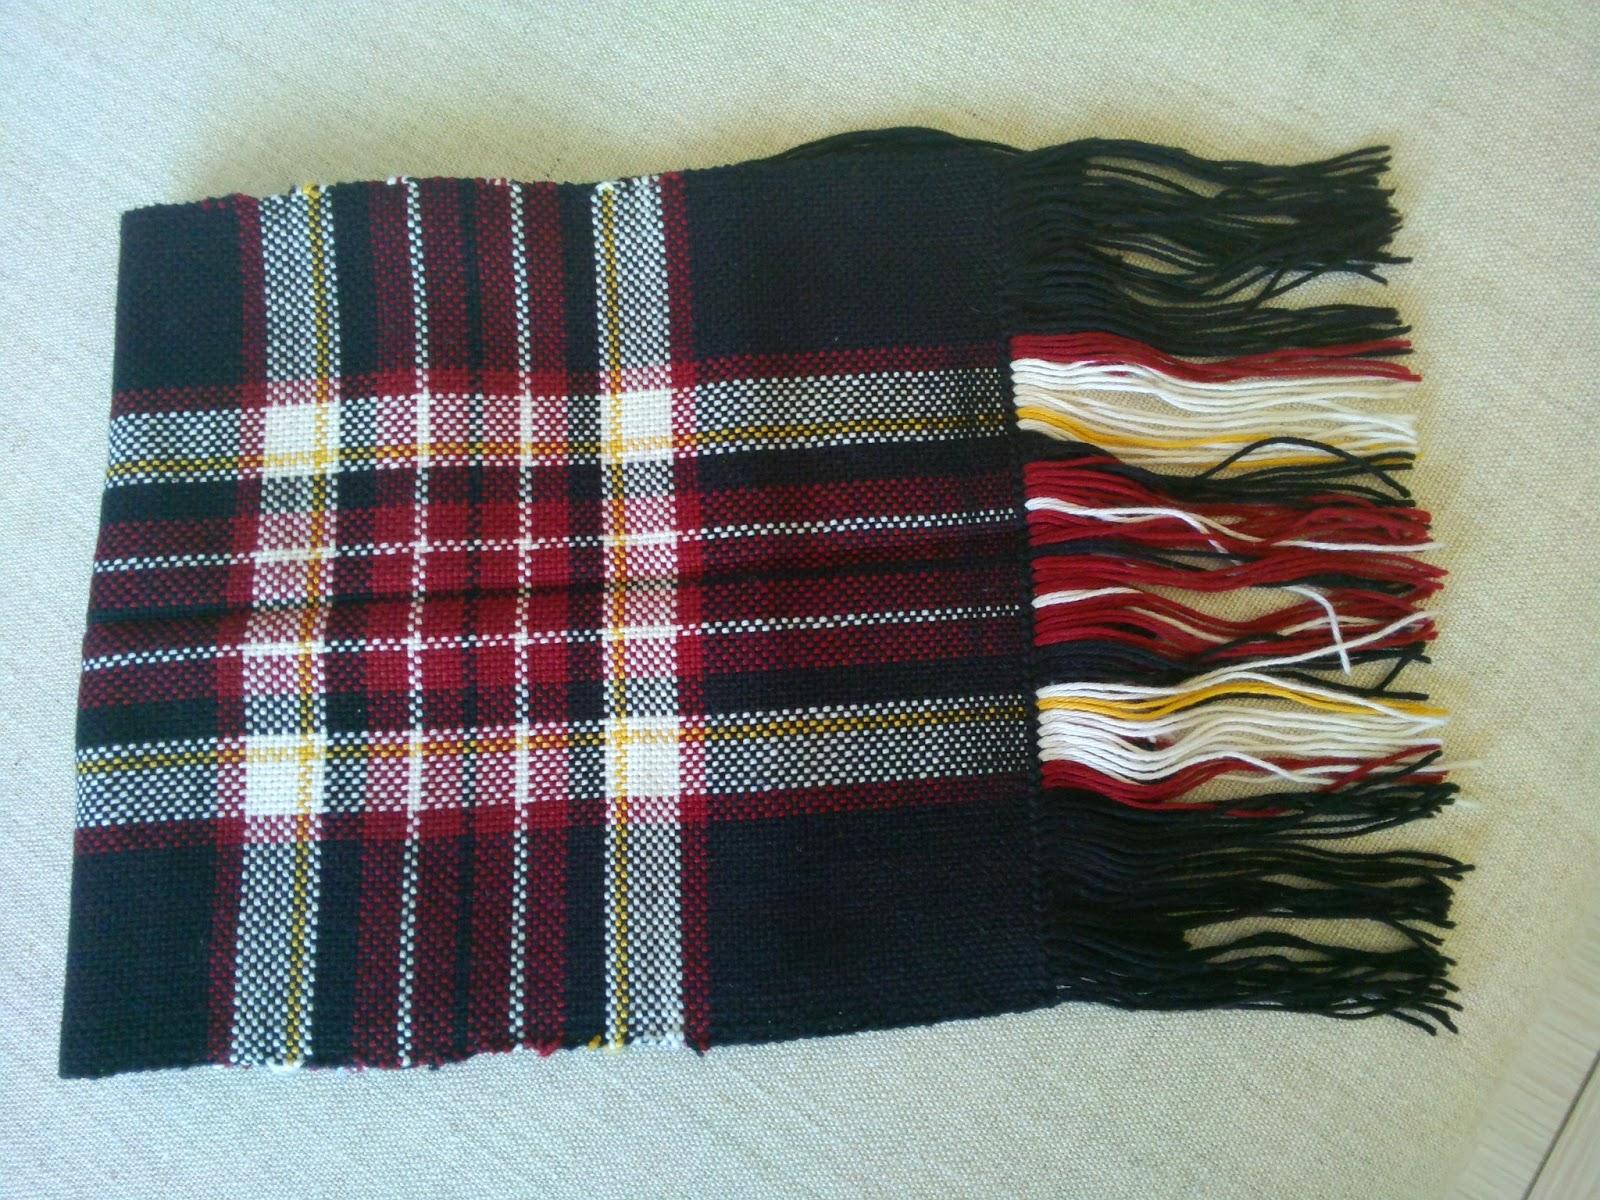 Weaving, knitting, crocheting   : KnitPicks scarf  First